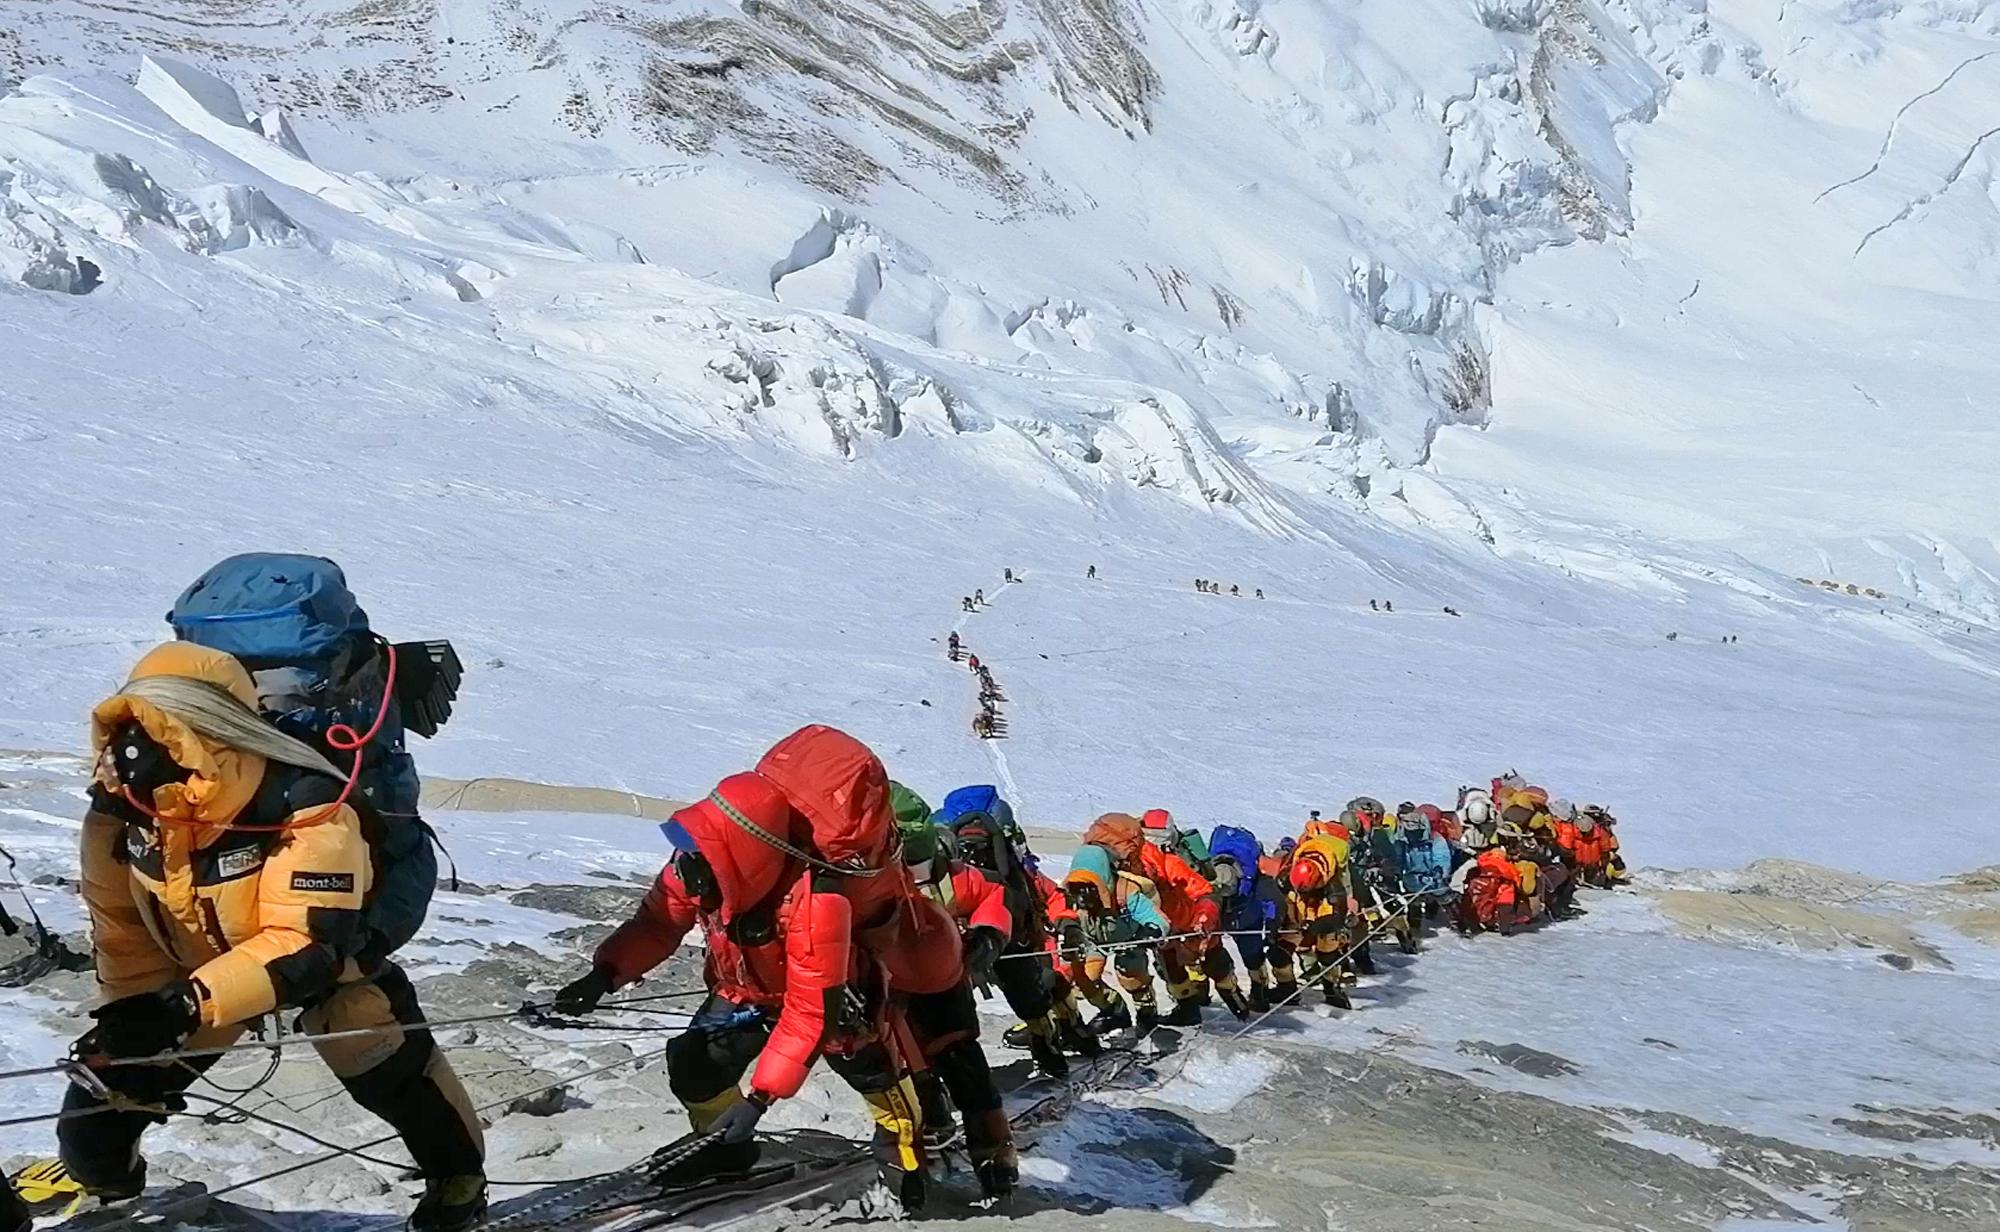 Nepal cancels spring mountain climbing season due to virus – KGET 17